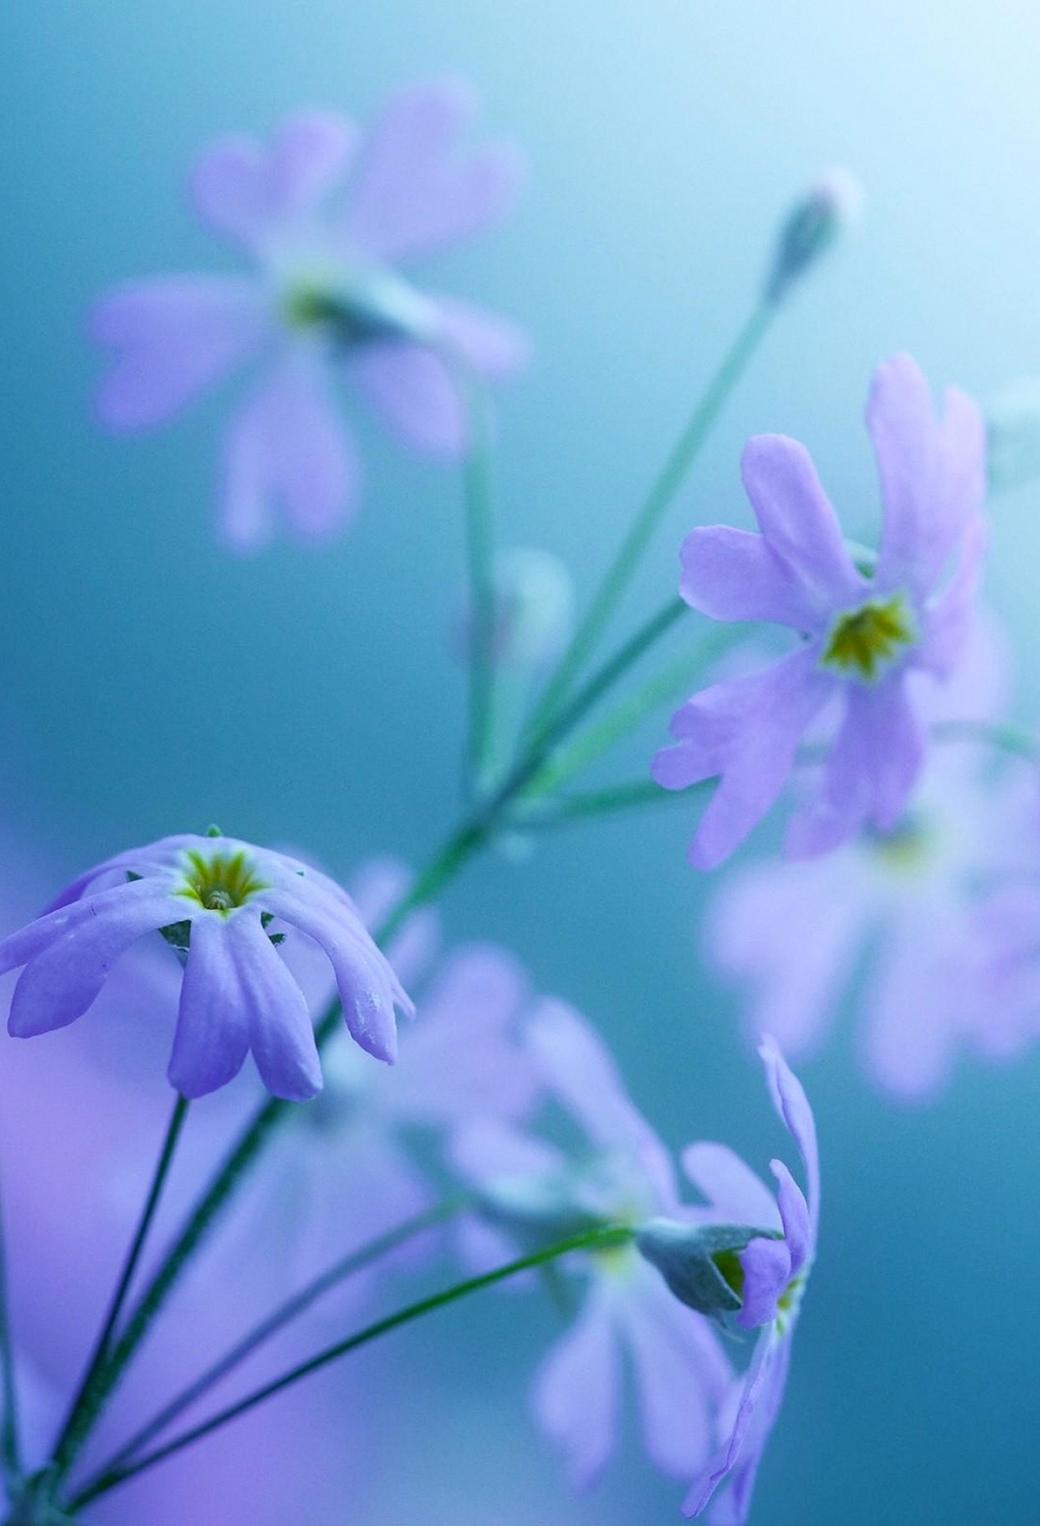 Purple Flowers 3Wallppaers iPhone Parallax Purple Flowers